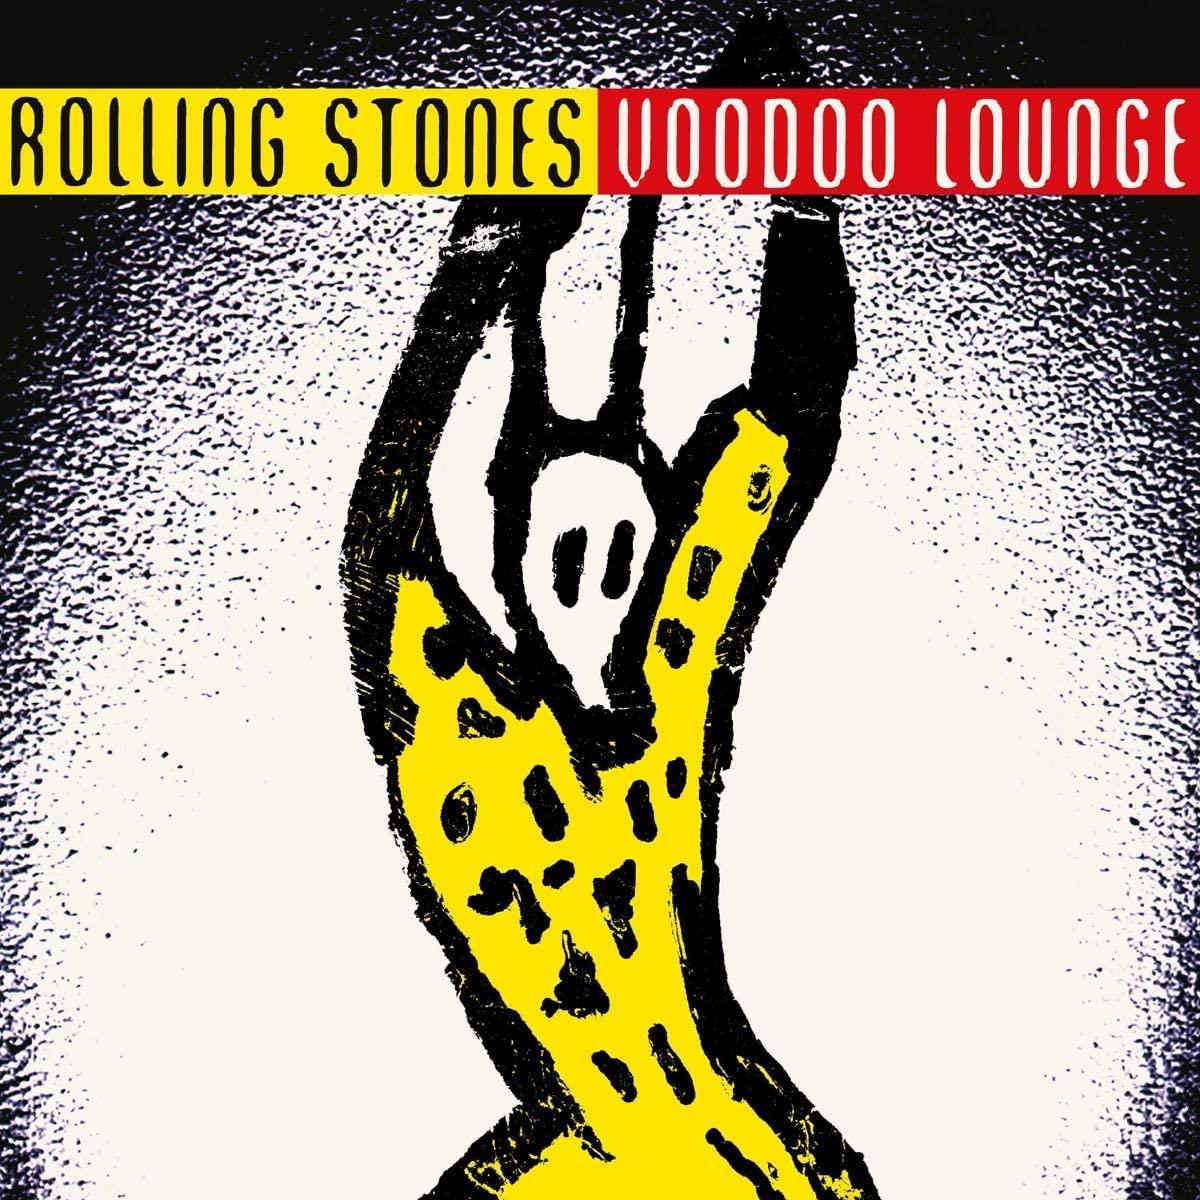 Copertina Vinile 33 giri Voodoo Lounge [2 LP] di The Rolling Stones